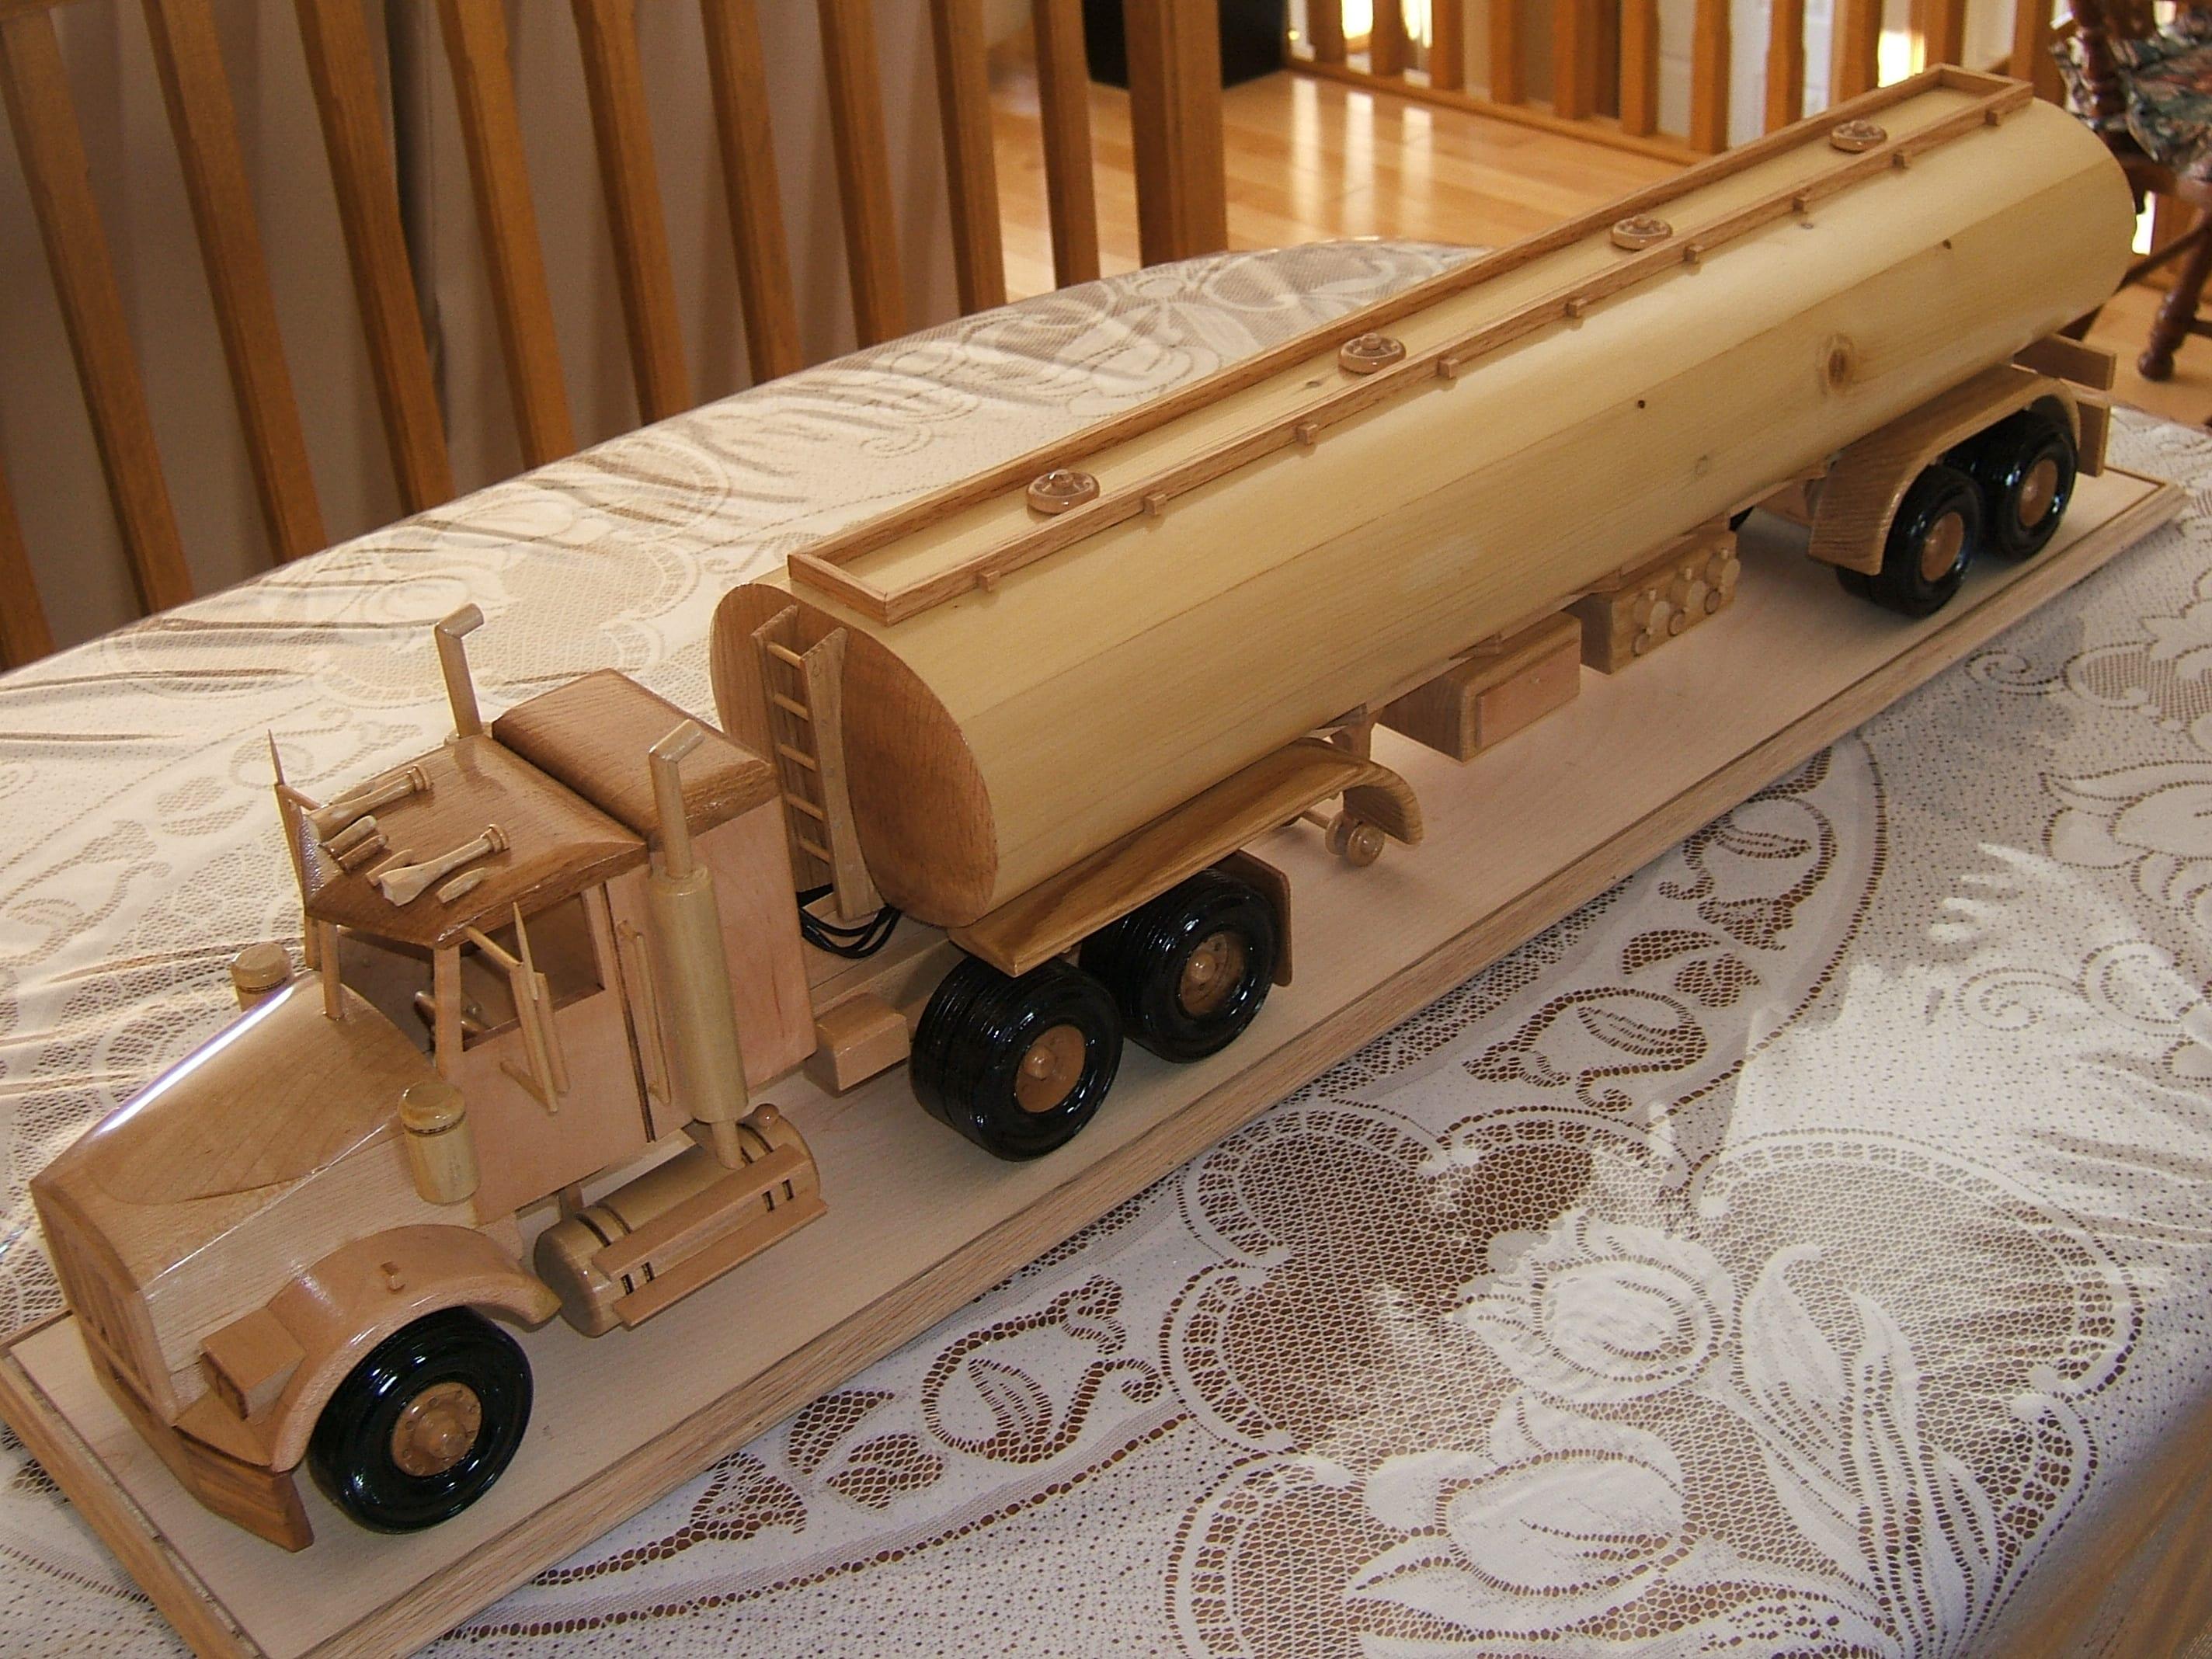 Building Toy Replicas